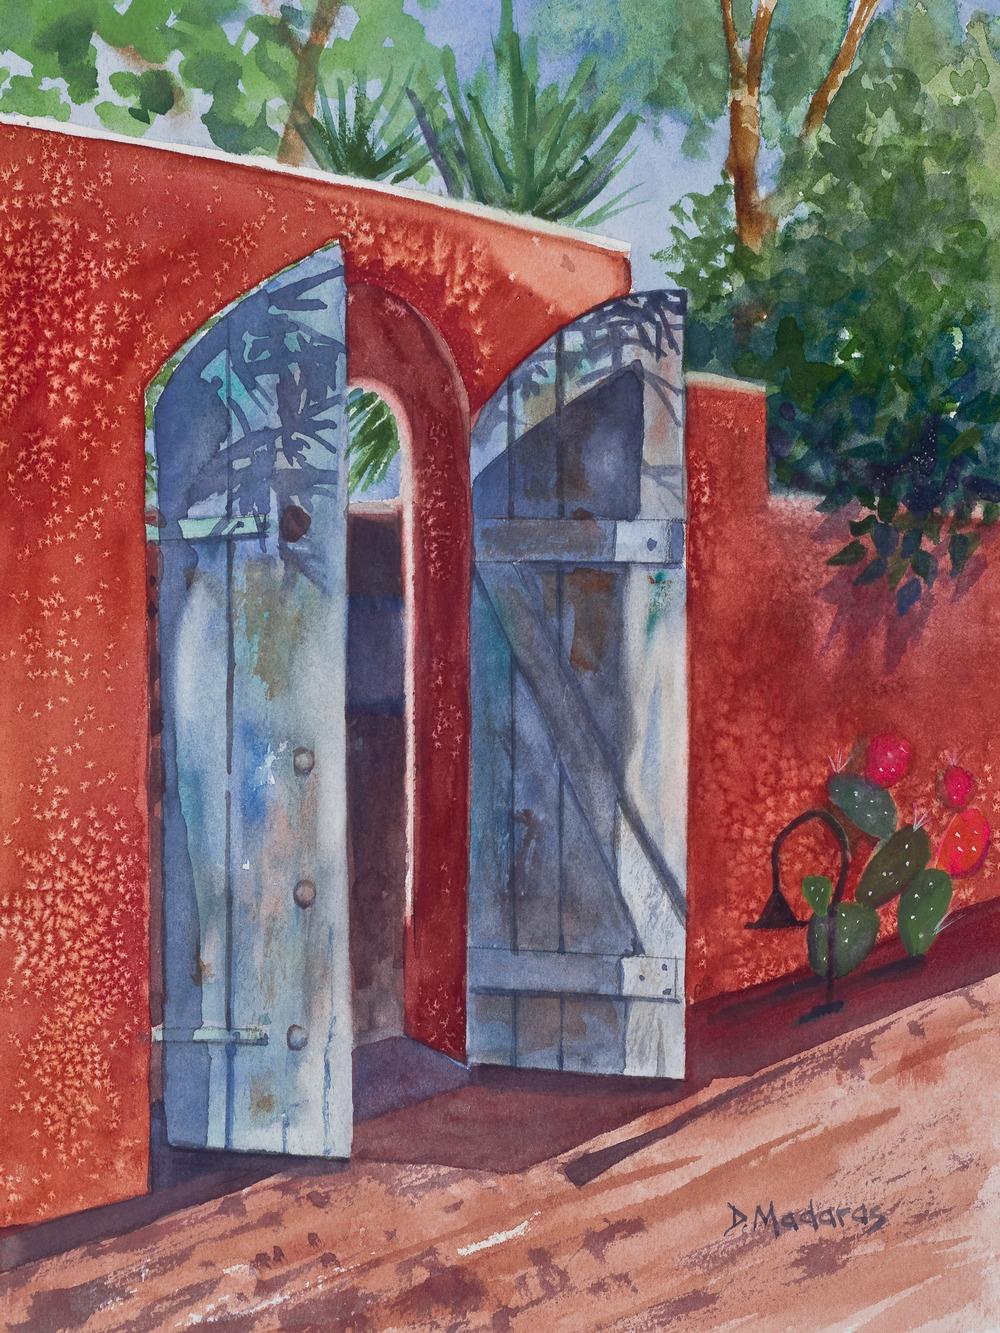 Gate at Osa by Diana Madaras